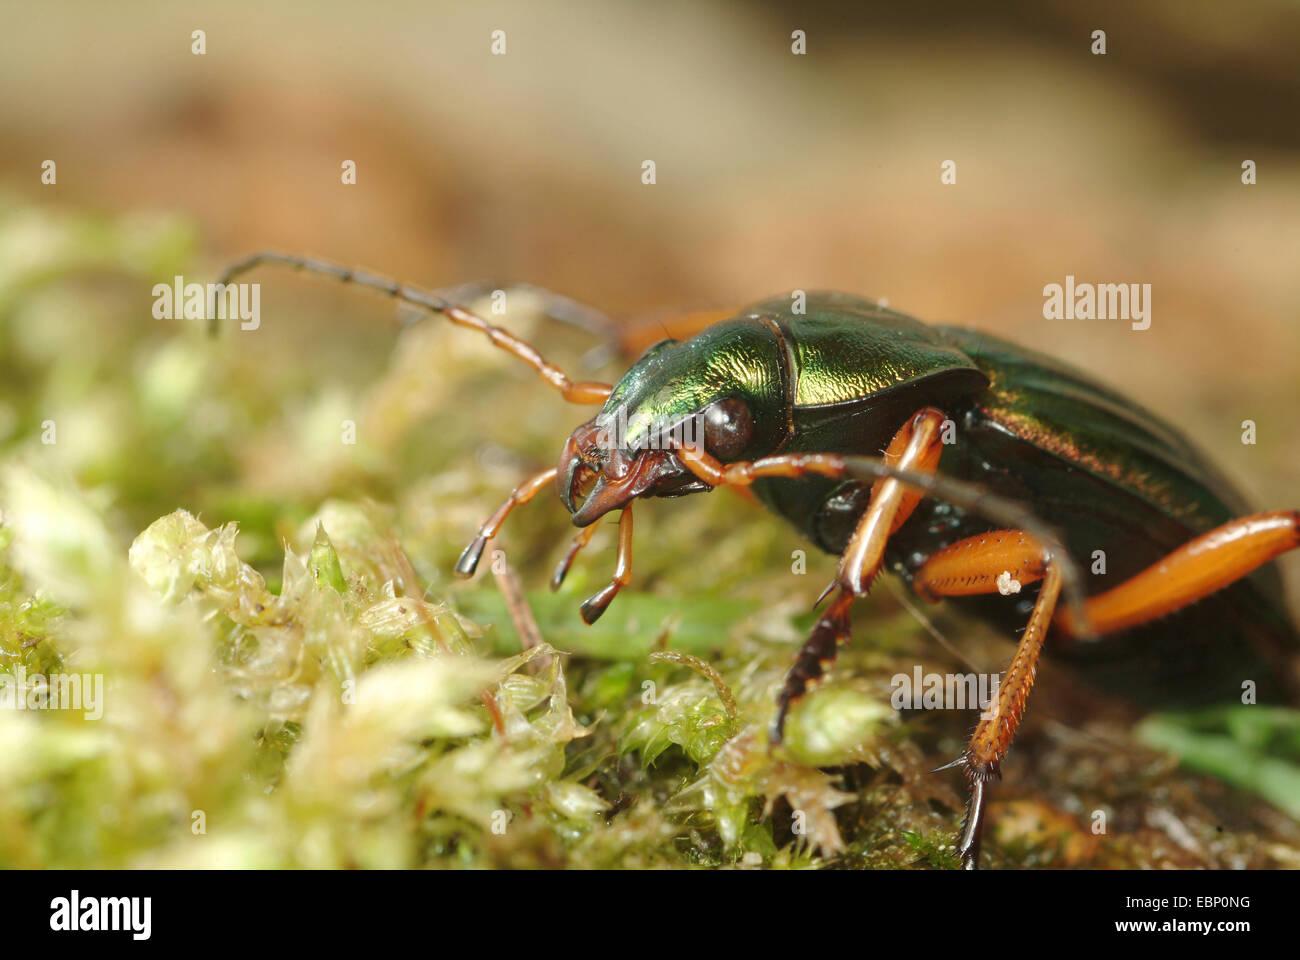 Golden ground beetle, Gilt ground beetle (Carabus auratus), portrait, Germany - Stock Image